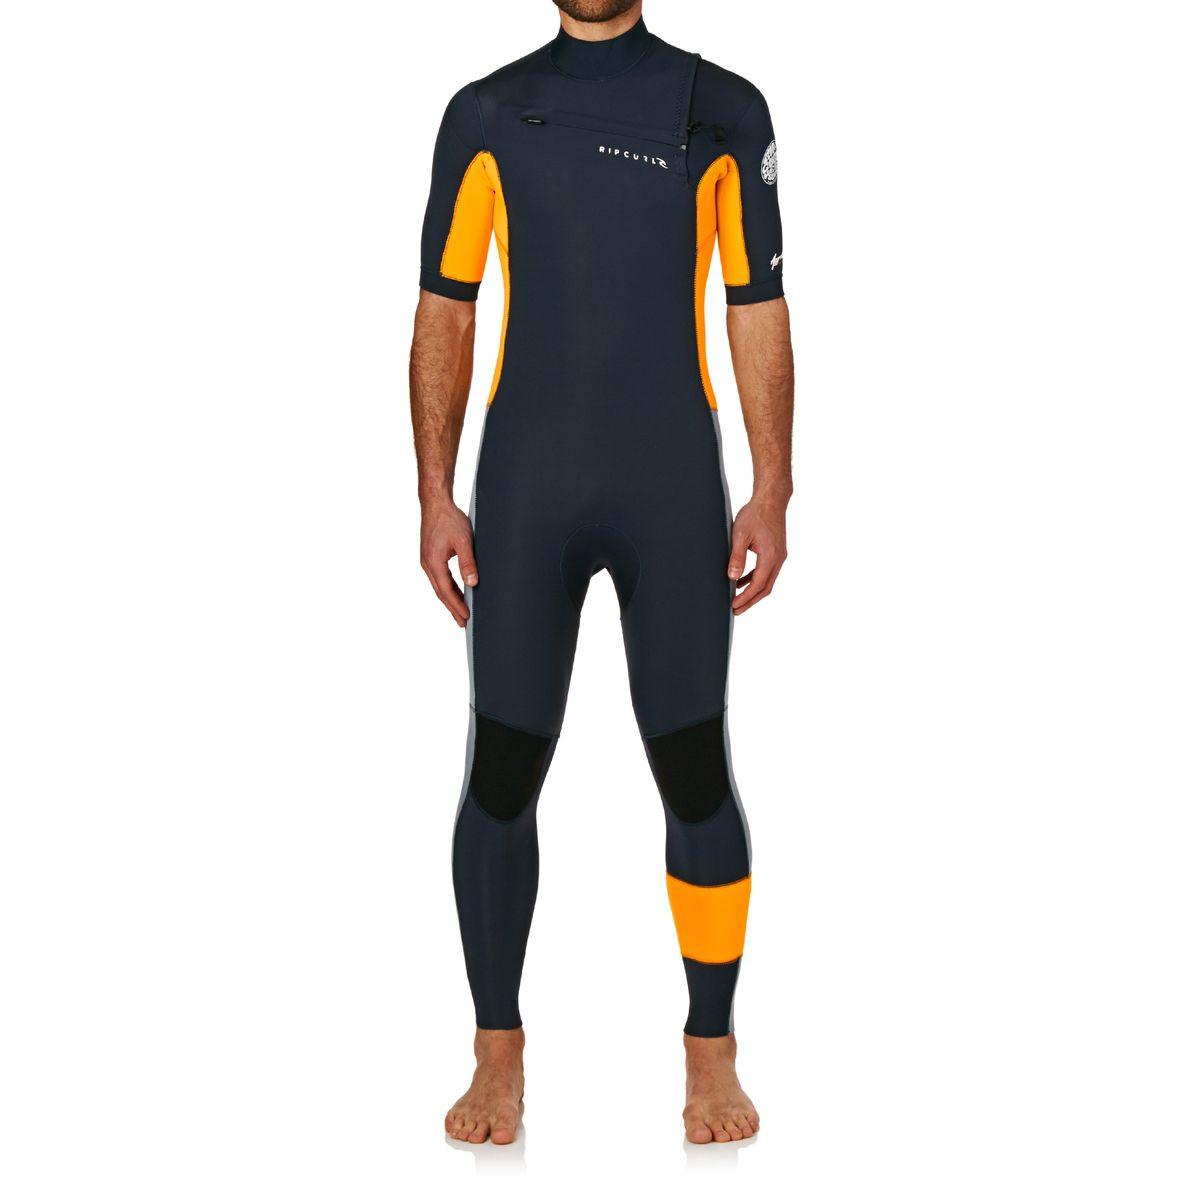 Rip Curl Aggrolite 2mm Chest Zip Short Sleeve Wetsuit - Slate